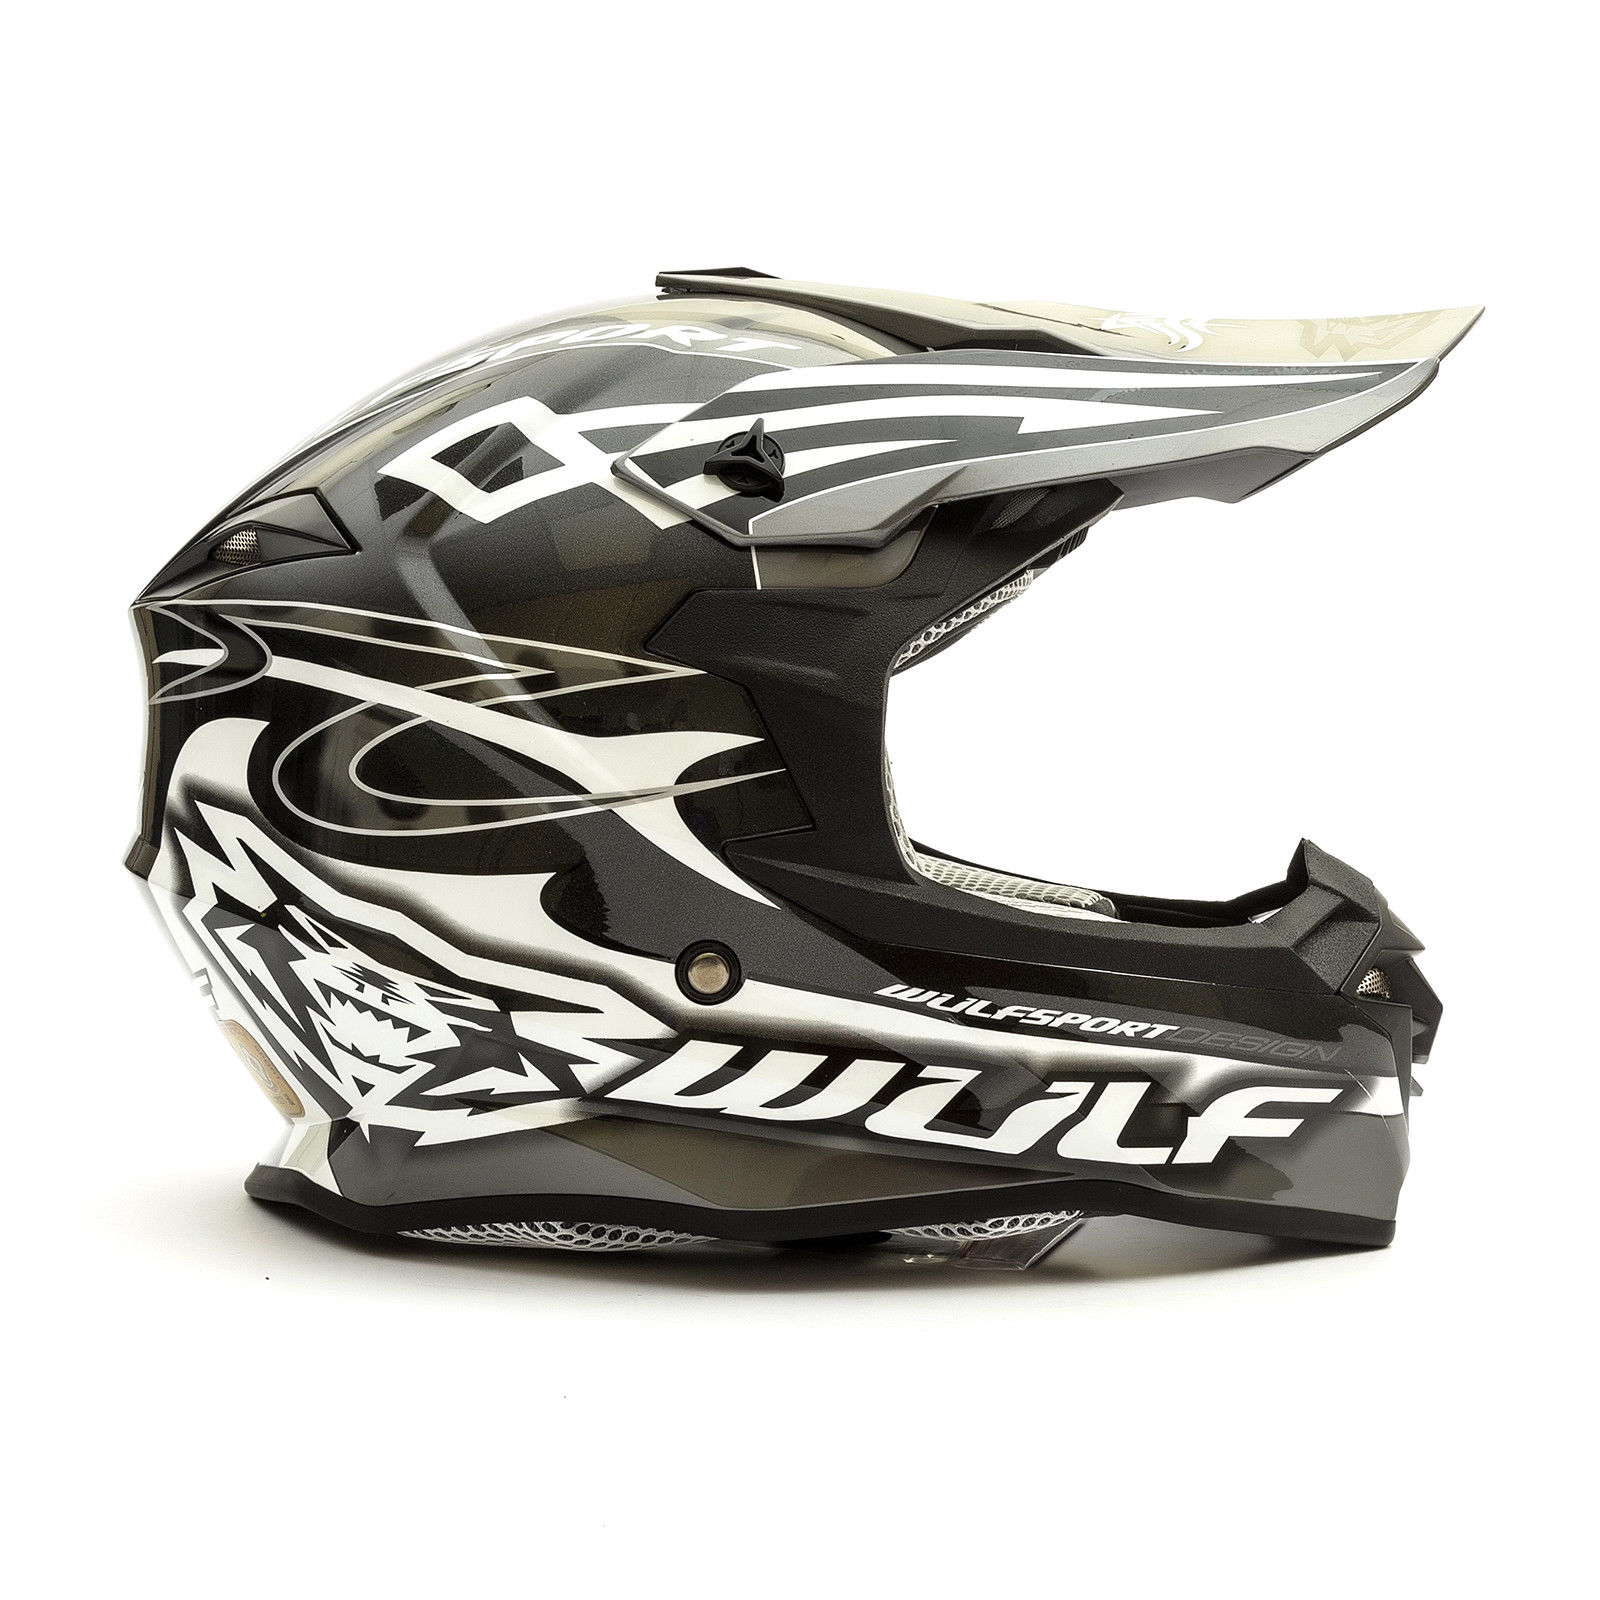 Wulfsport-Adult-Sceptre-Helmets-Motocross-Pitbike-Motorbike-Off-Road-Racing-ATV thumbnail 13